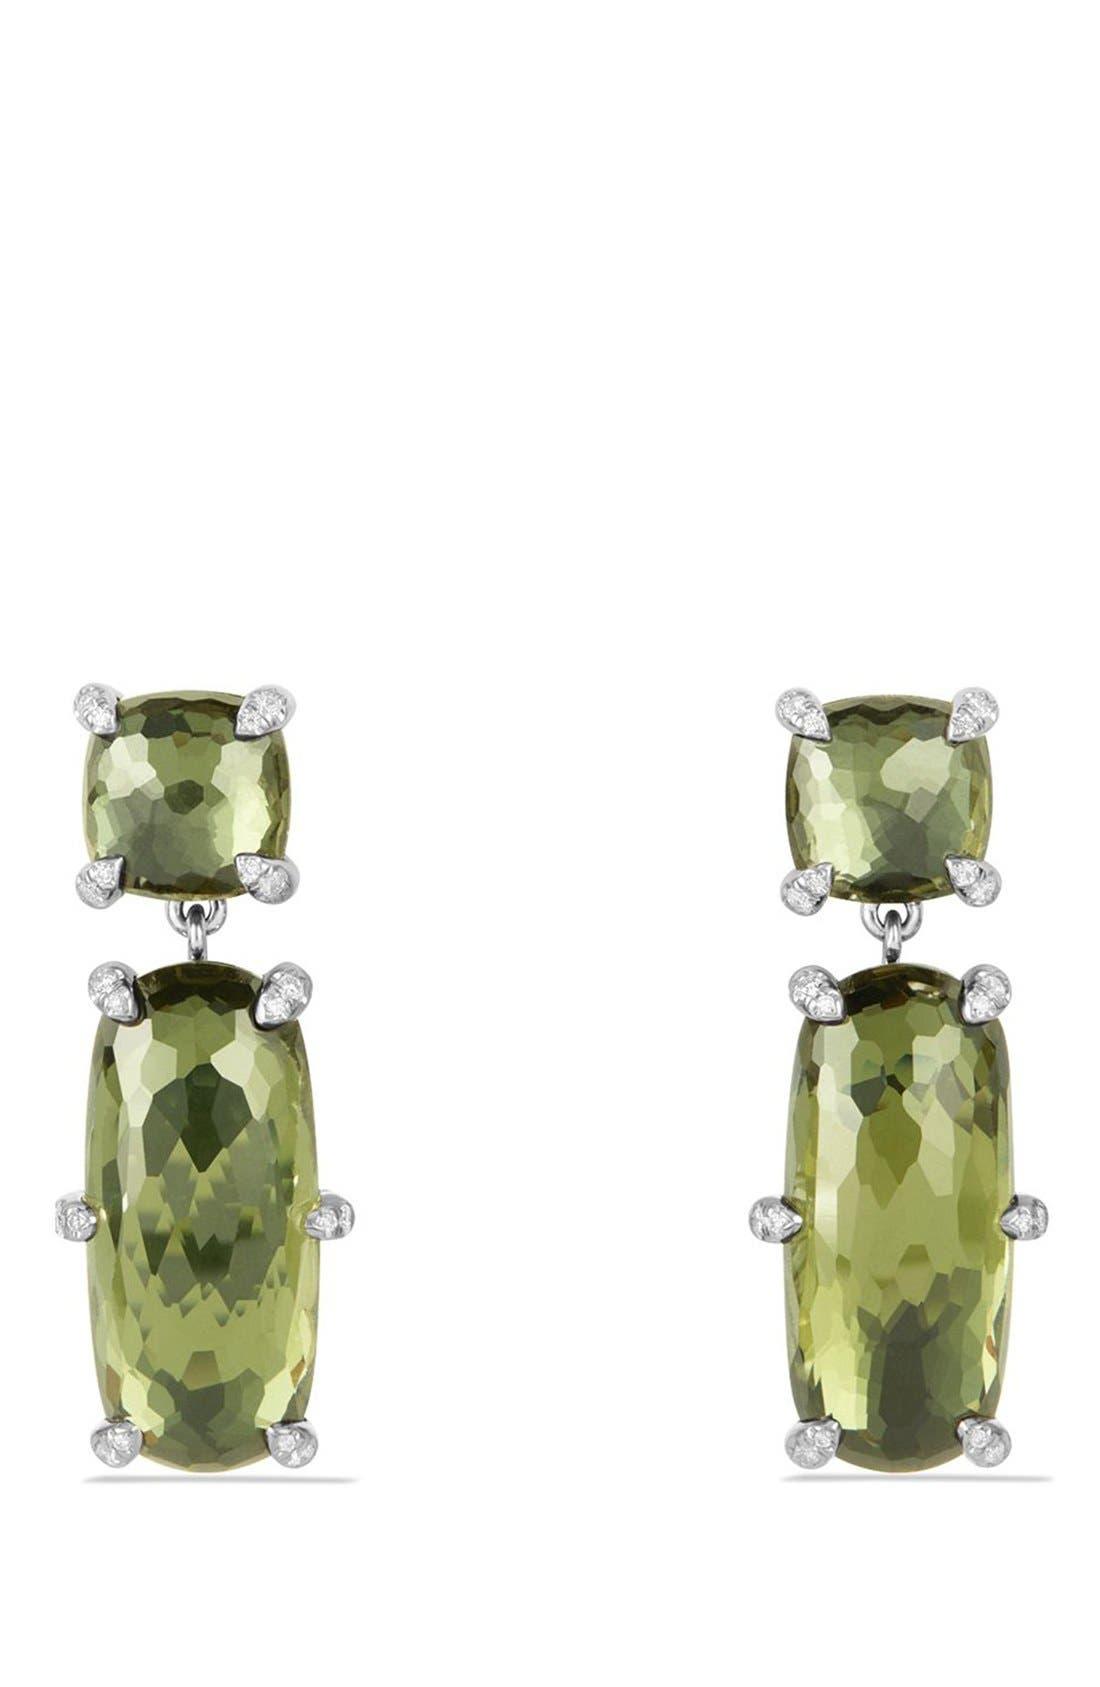 'Châtelaine' Double Drop Earrings,                             Main thumbnail 1, color,                             Silver/ Citrine/ Hematine